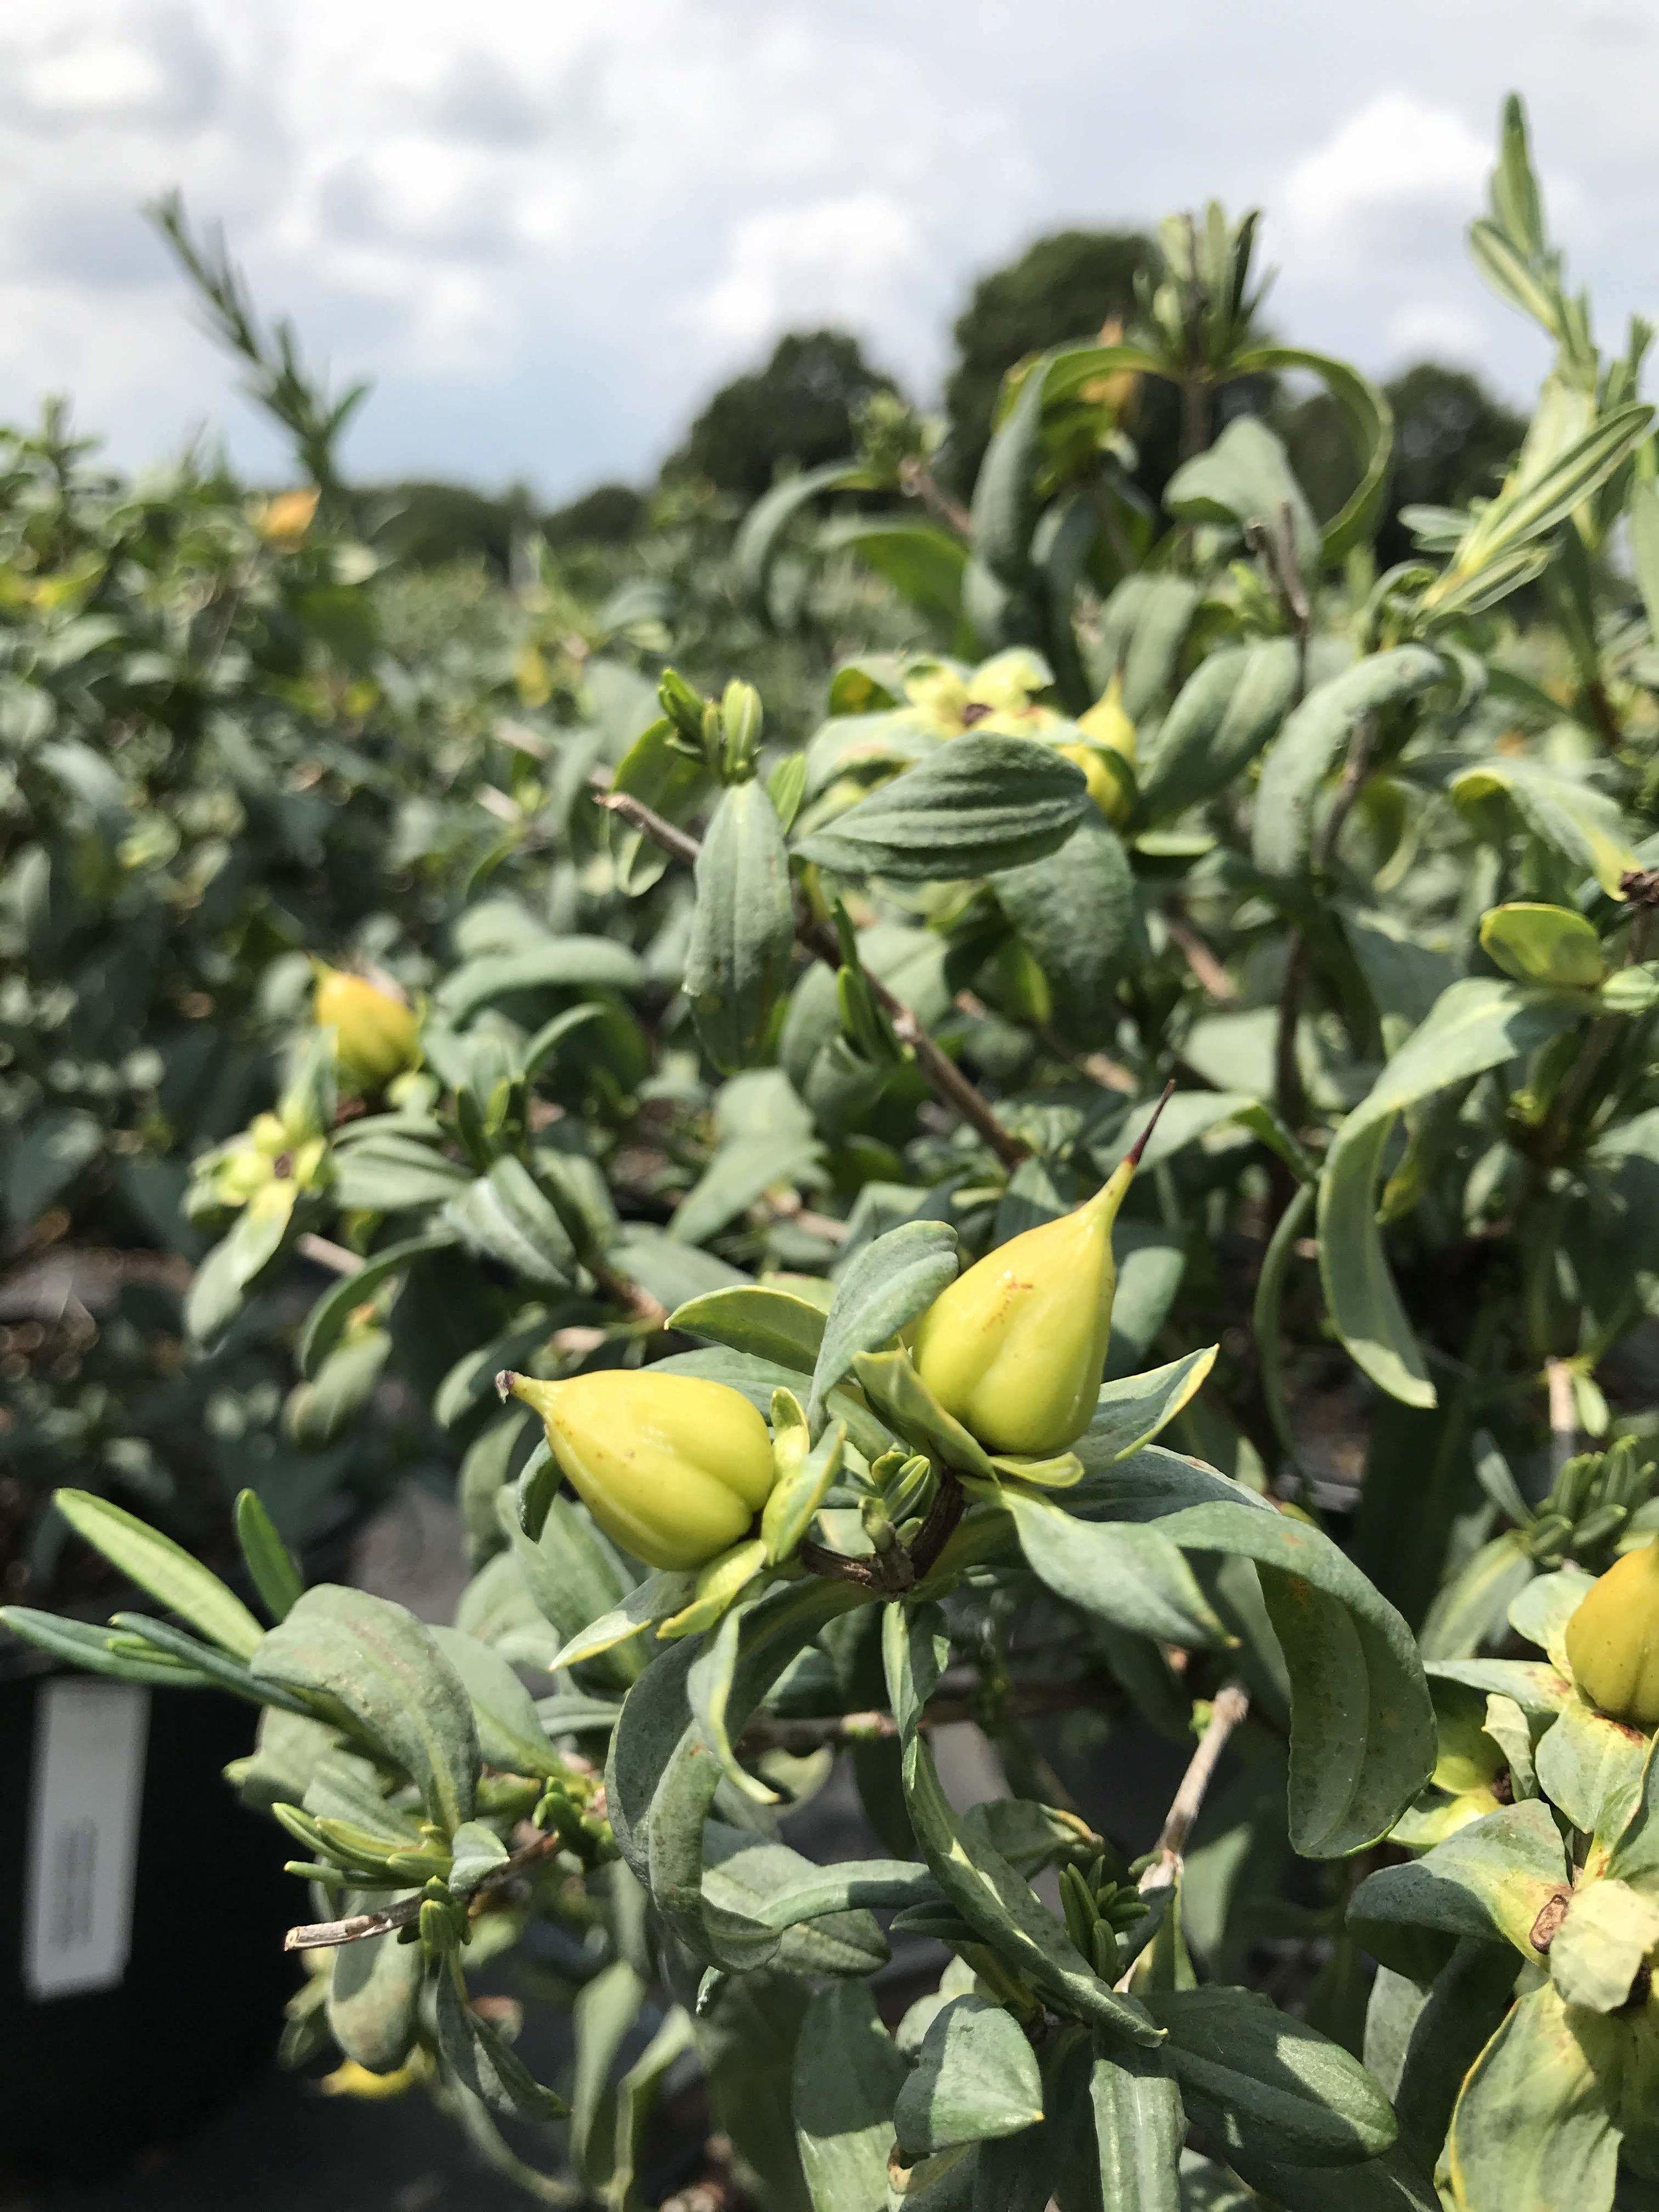 Hypericum frondosum 'Sunburst' 3 gallon